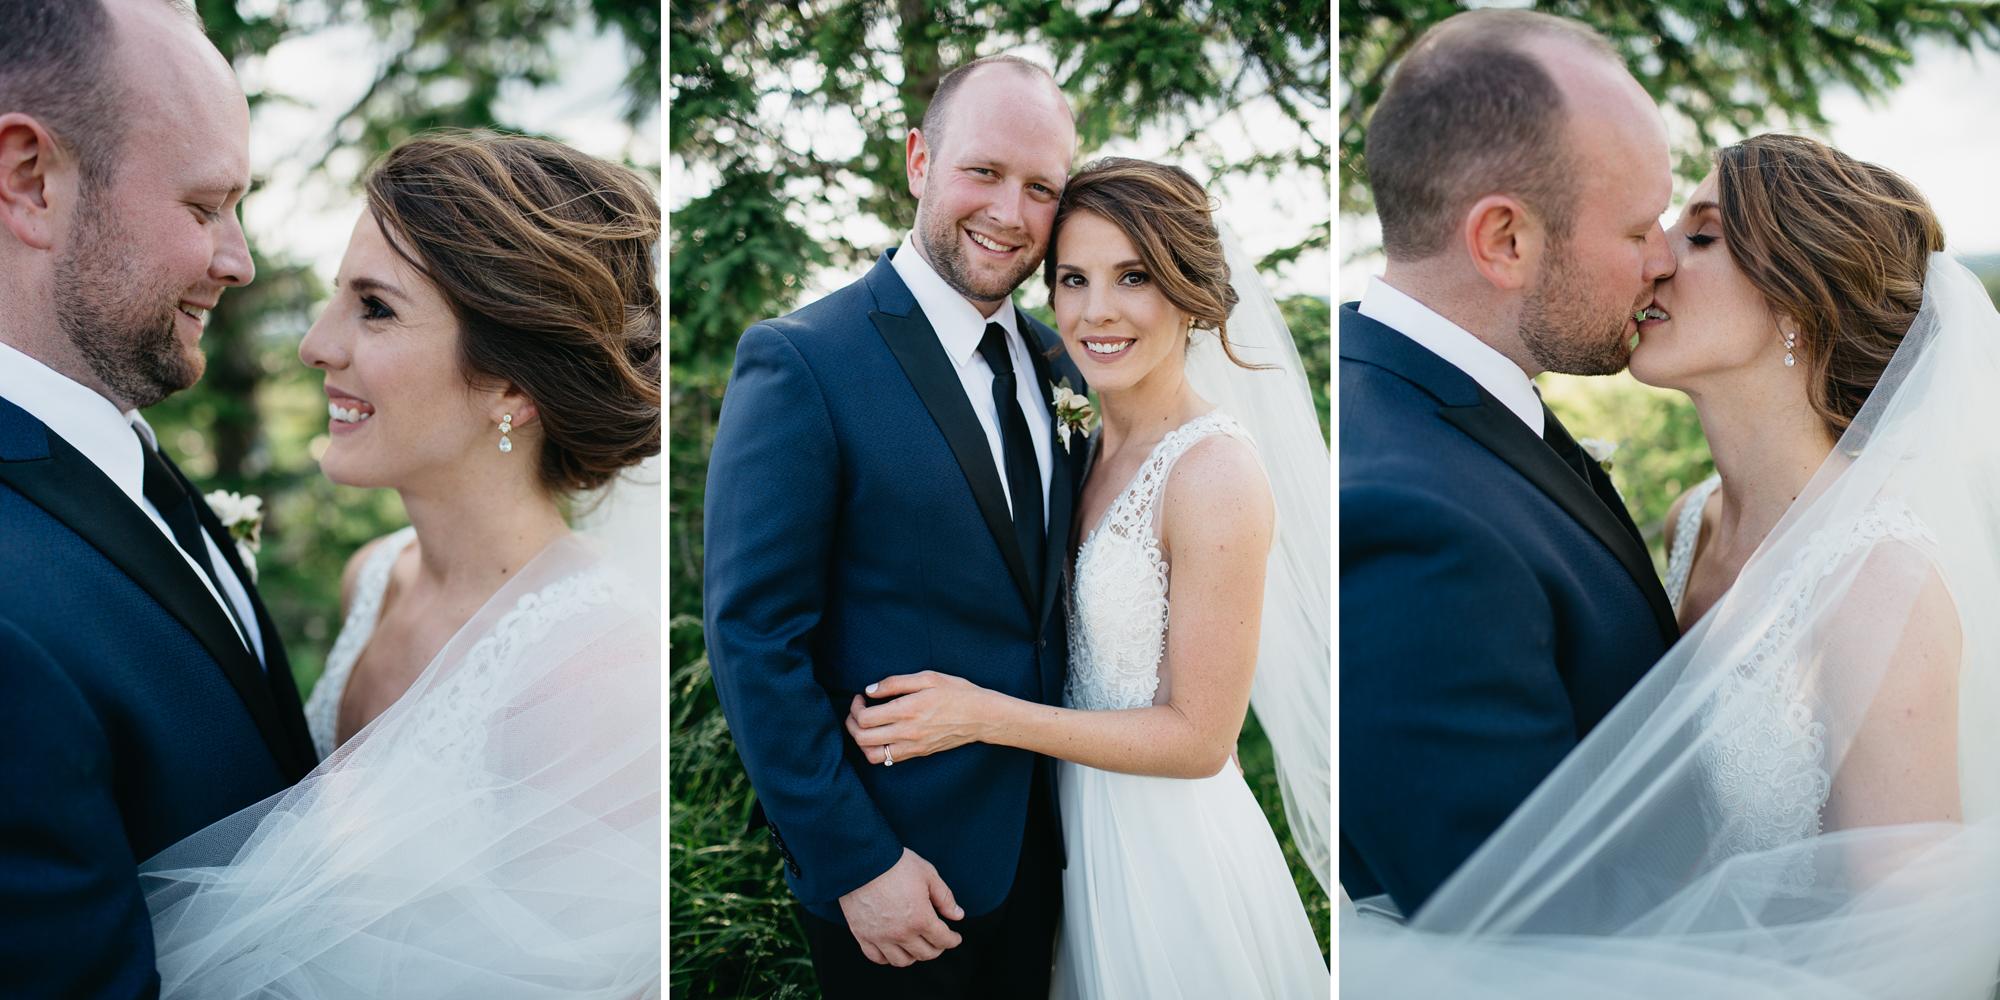 Jaclyn_Andrew_quincy_massachusetts_wedding017.jpg